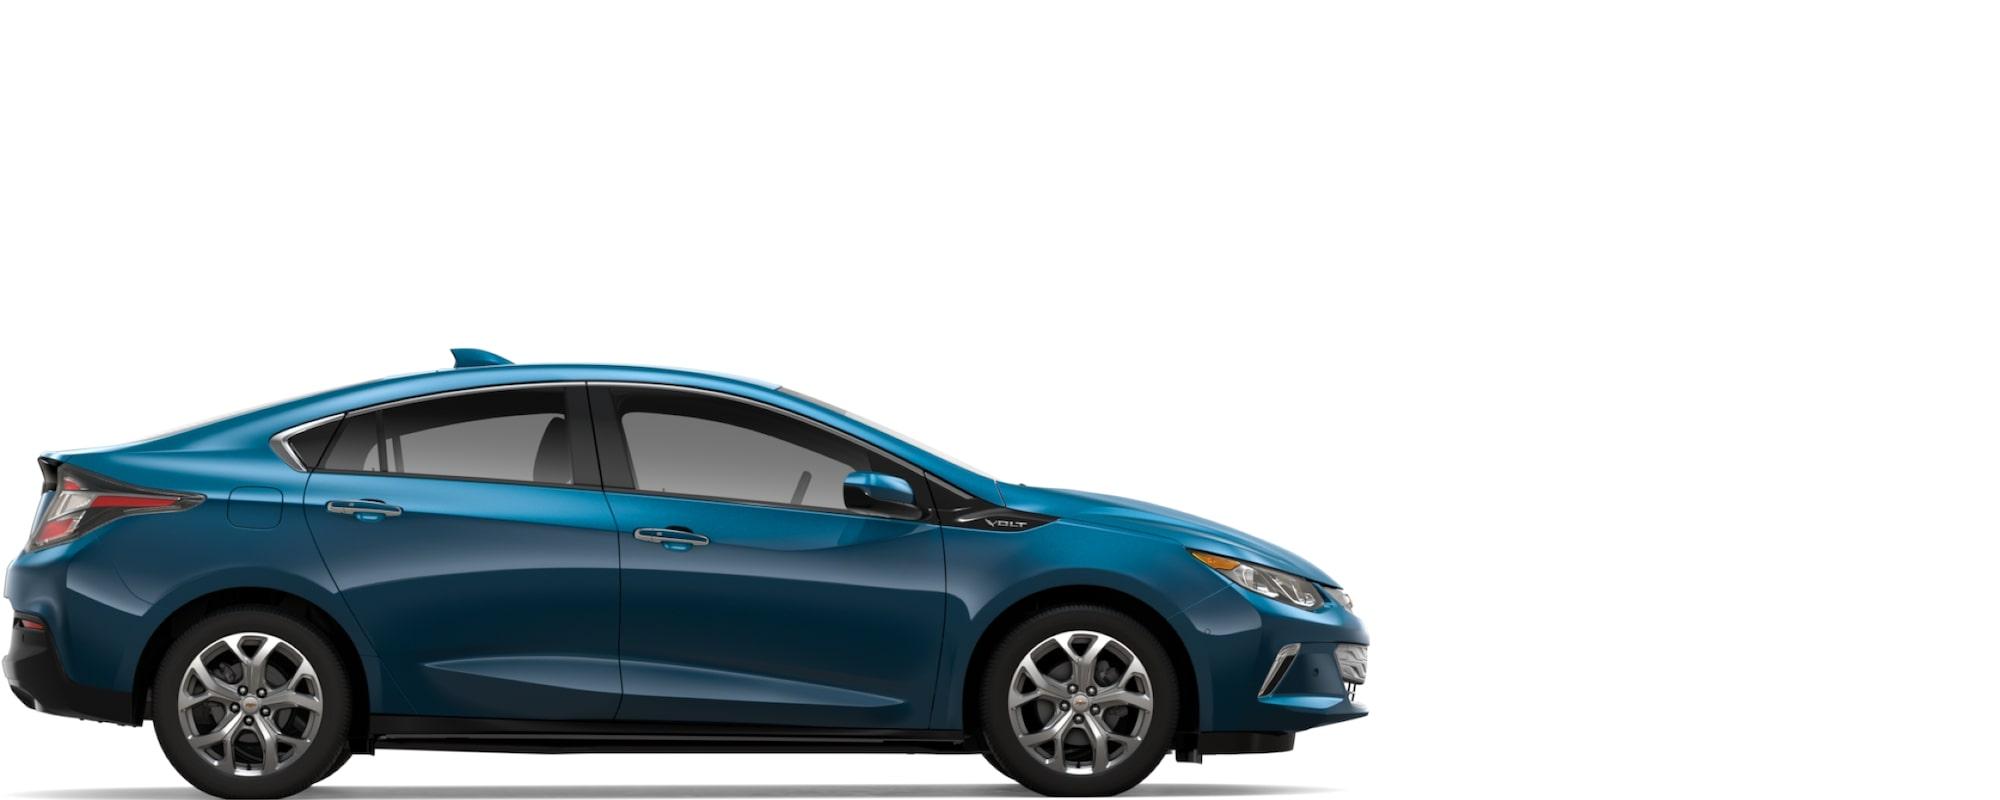 Gm Chevy Volt 12 System Diagram Wiring Schematics Chevrolet 2019 Bolt Ev Electric Car An Affordable All 6v To 12v